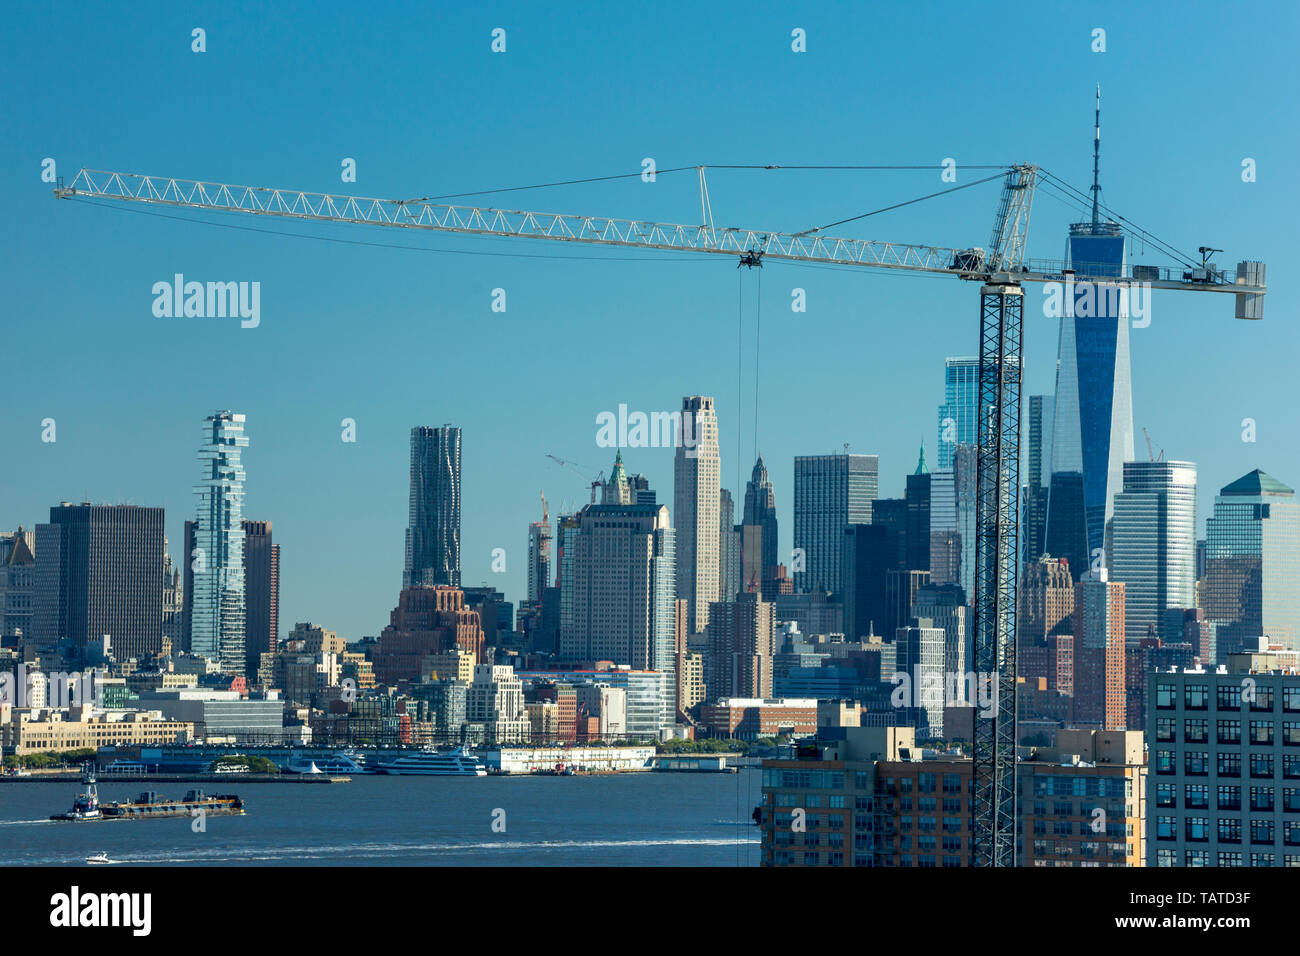 DOWNTOWN MANHATTAN SKYLINE HUDSON RIVER WITH CONSTRUCTION CRANES HOBOKEN NEW JERSEY USA Stock Photo